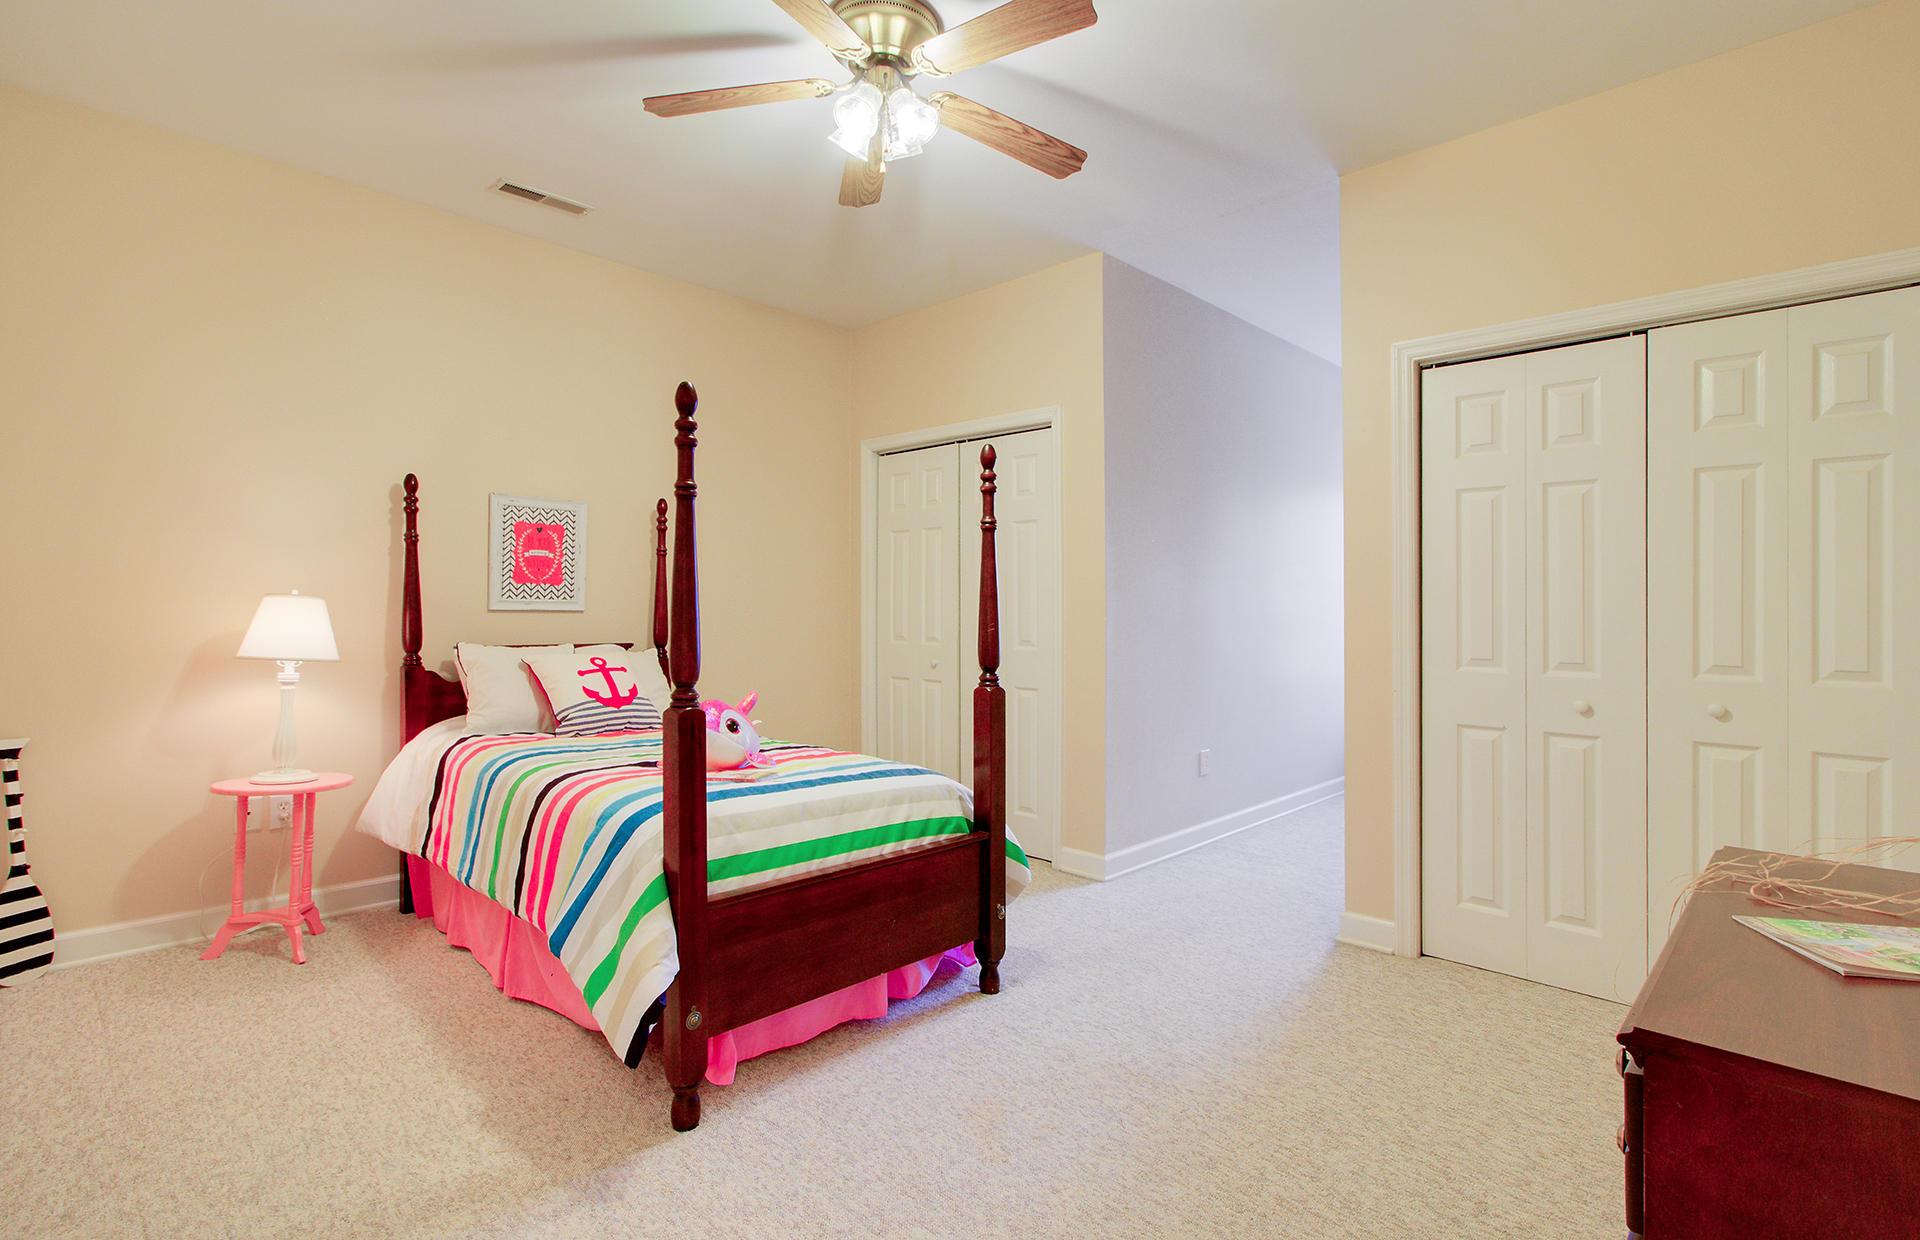 Bakers Landing Homes For Sale - 105 River Oak, North Charleston, SC - 4